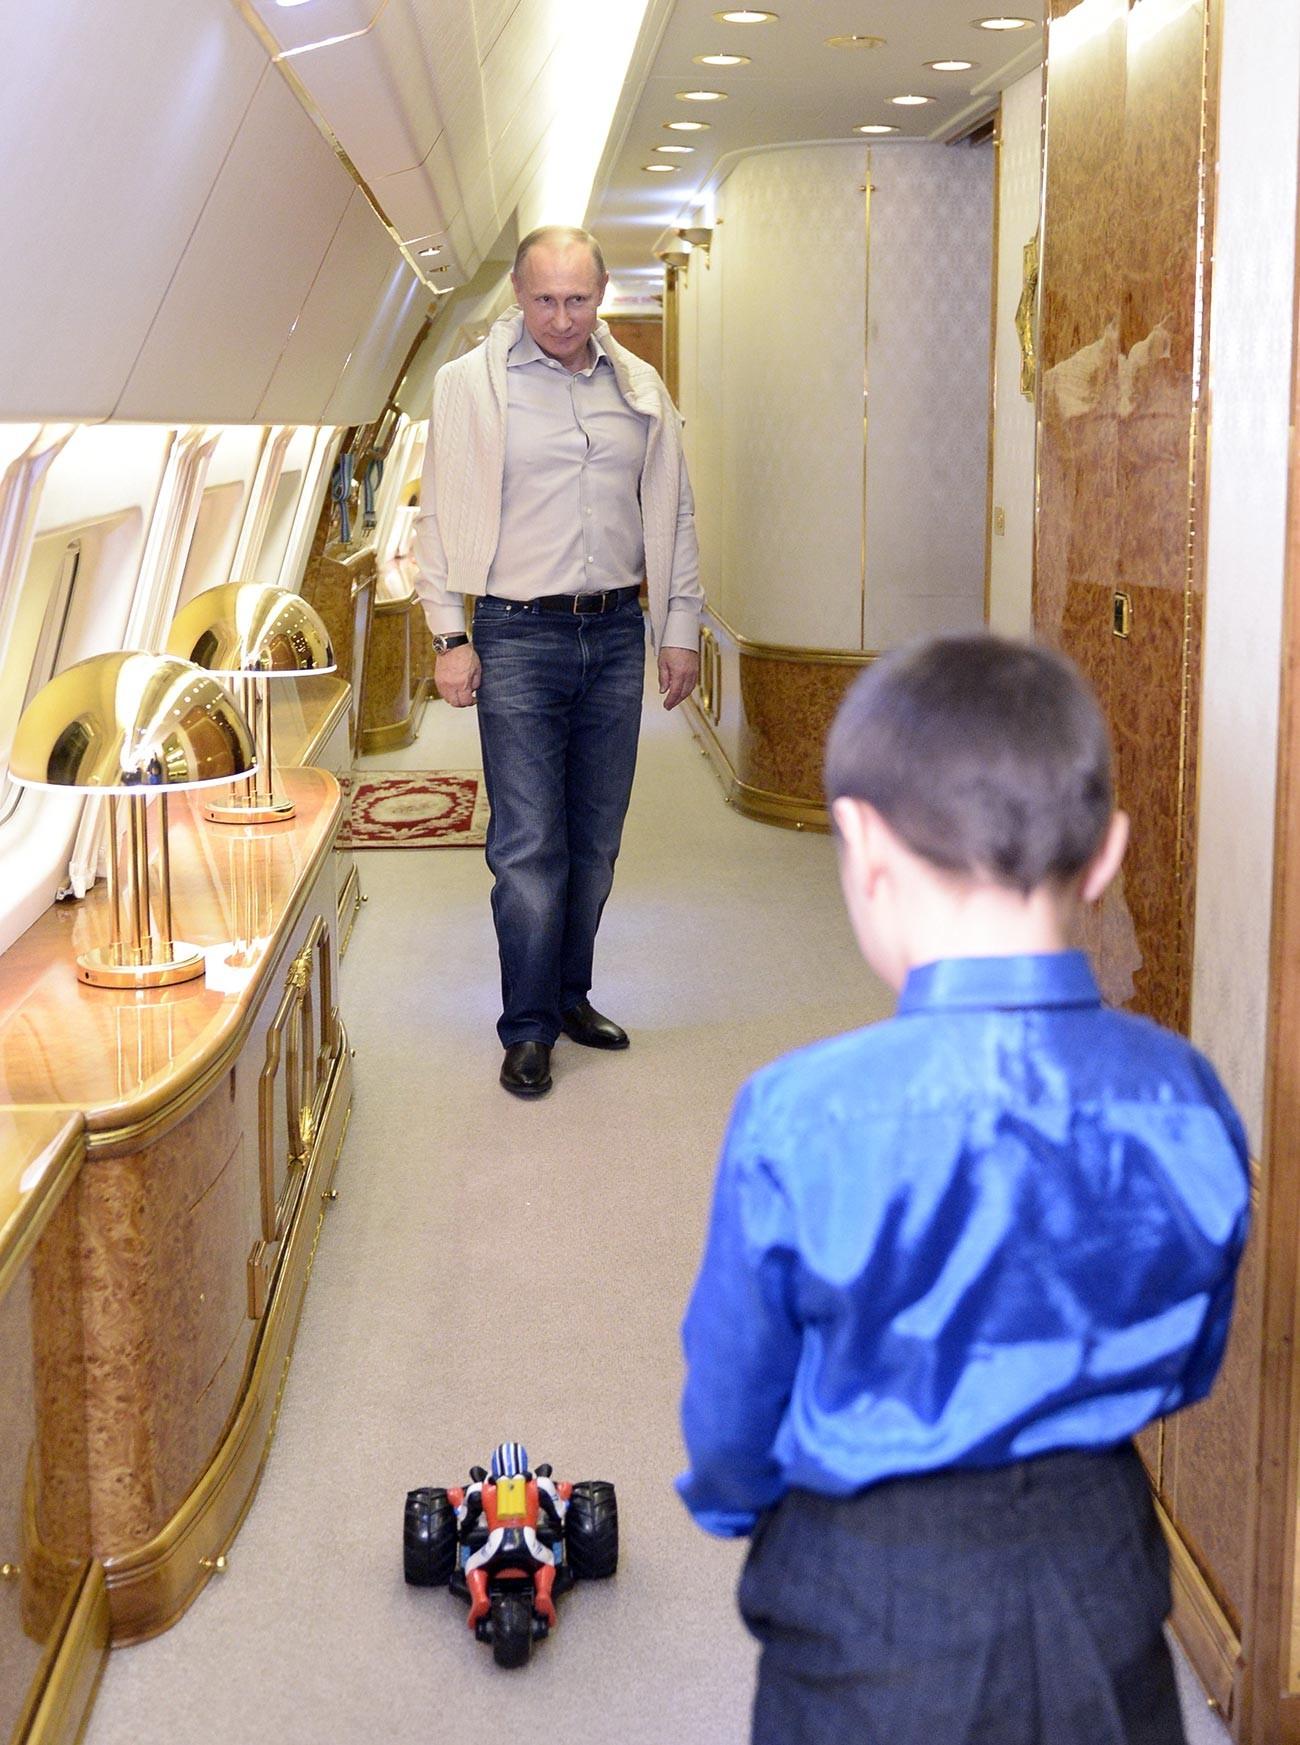 Estudante bachkírio Arslan Kaipkulov em passeio a bordo do avião presidencial